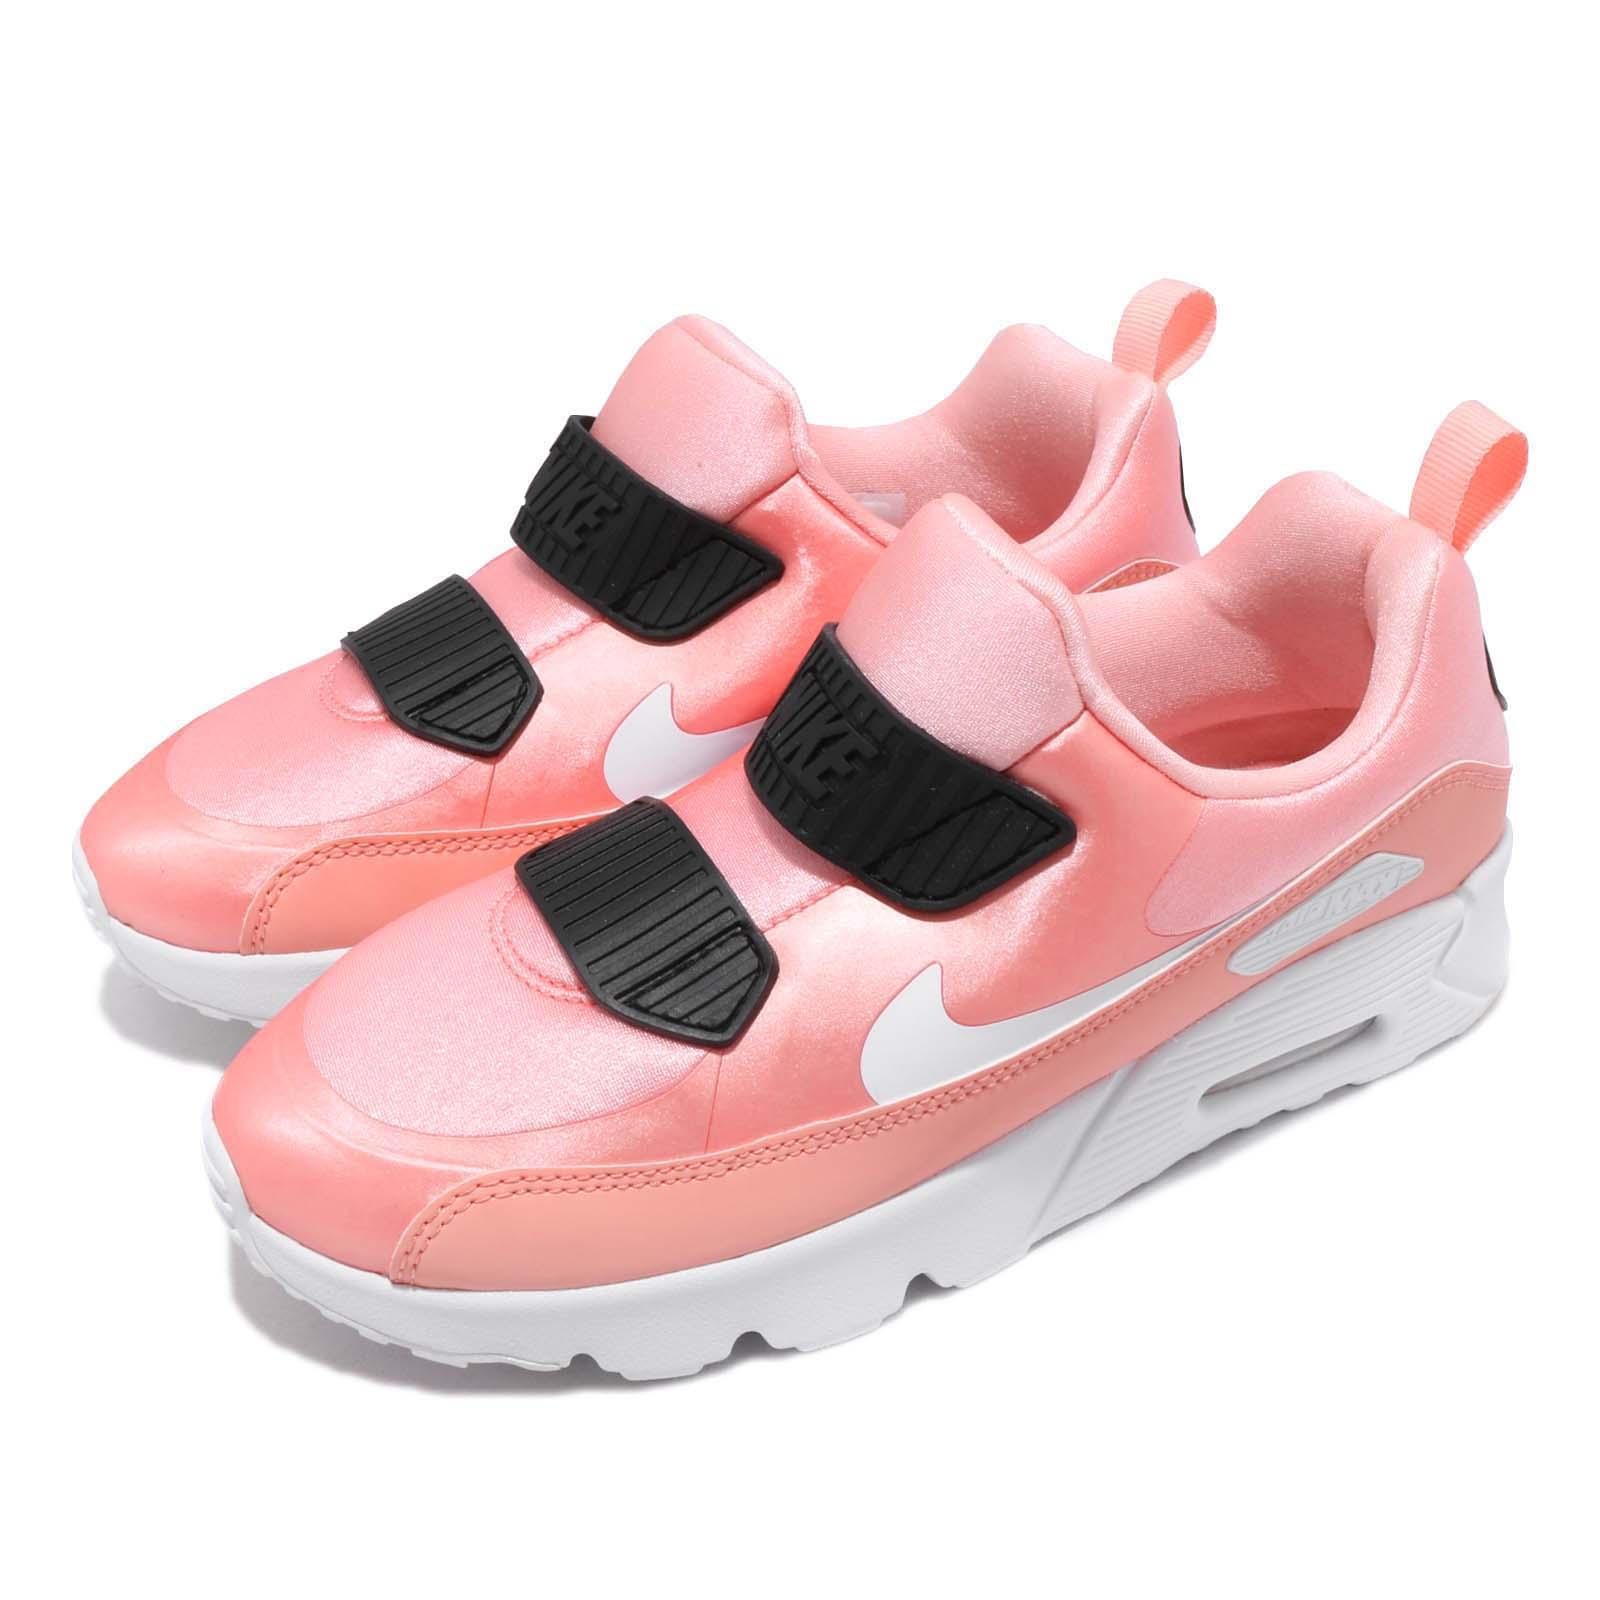 Nike 慢跑鞋 Air Max Tiny 90 PS 童鞋 AV3194-600